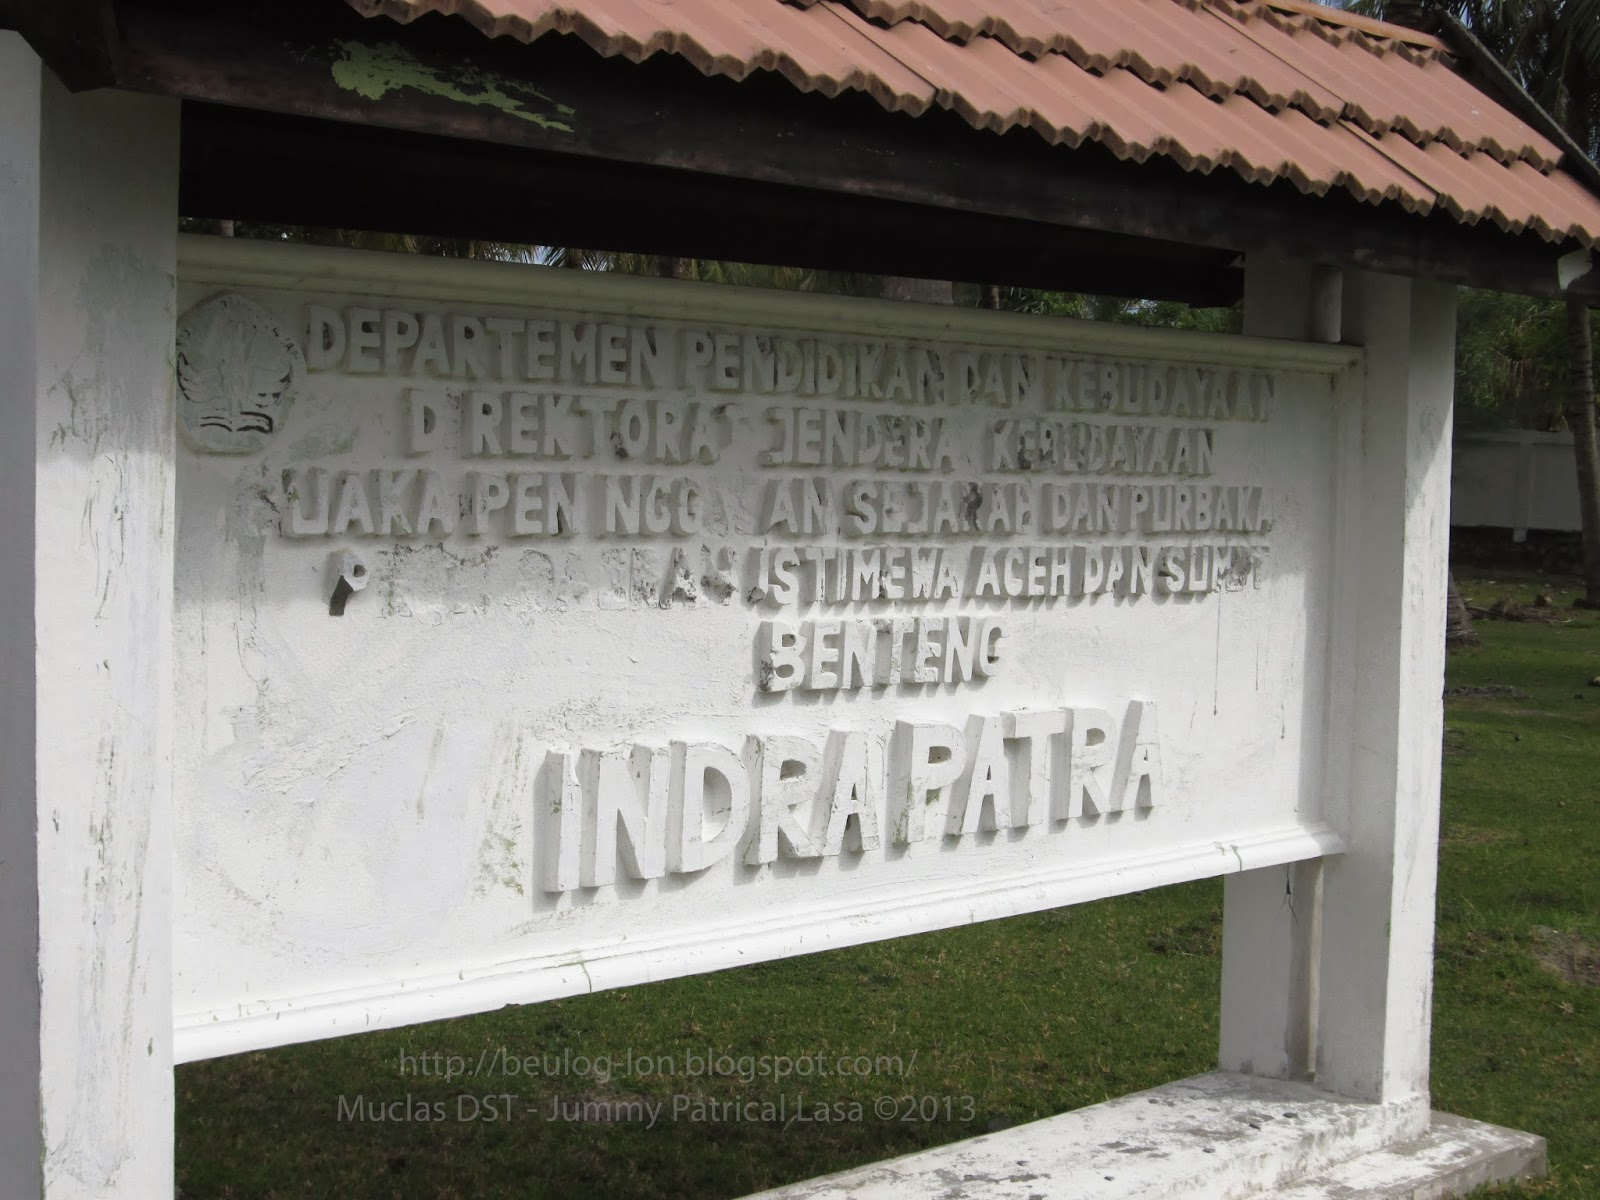 Benteng Indra Patra Bukti Historis Perlahan Terkikis Indrapatra Kota Banda